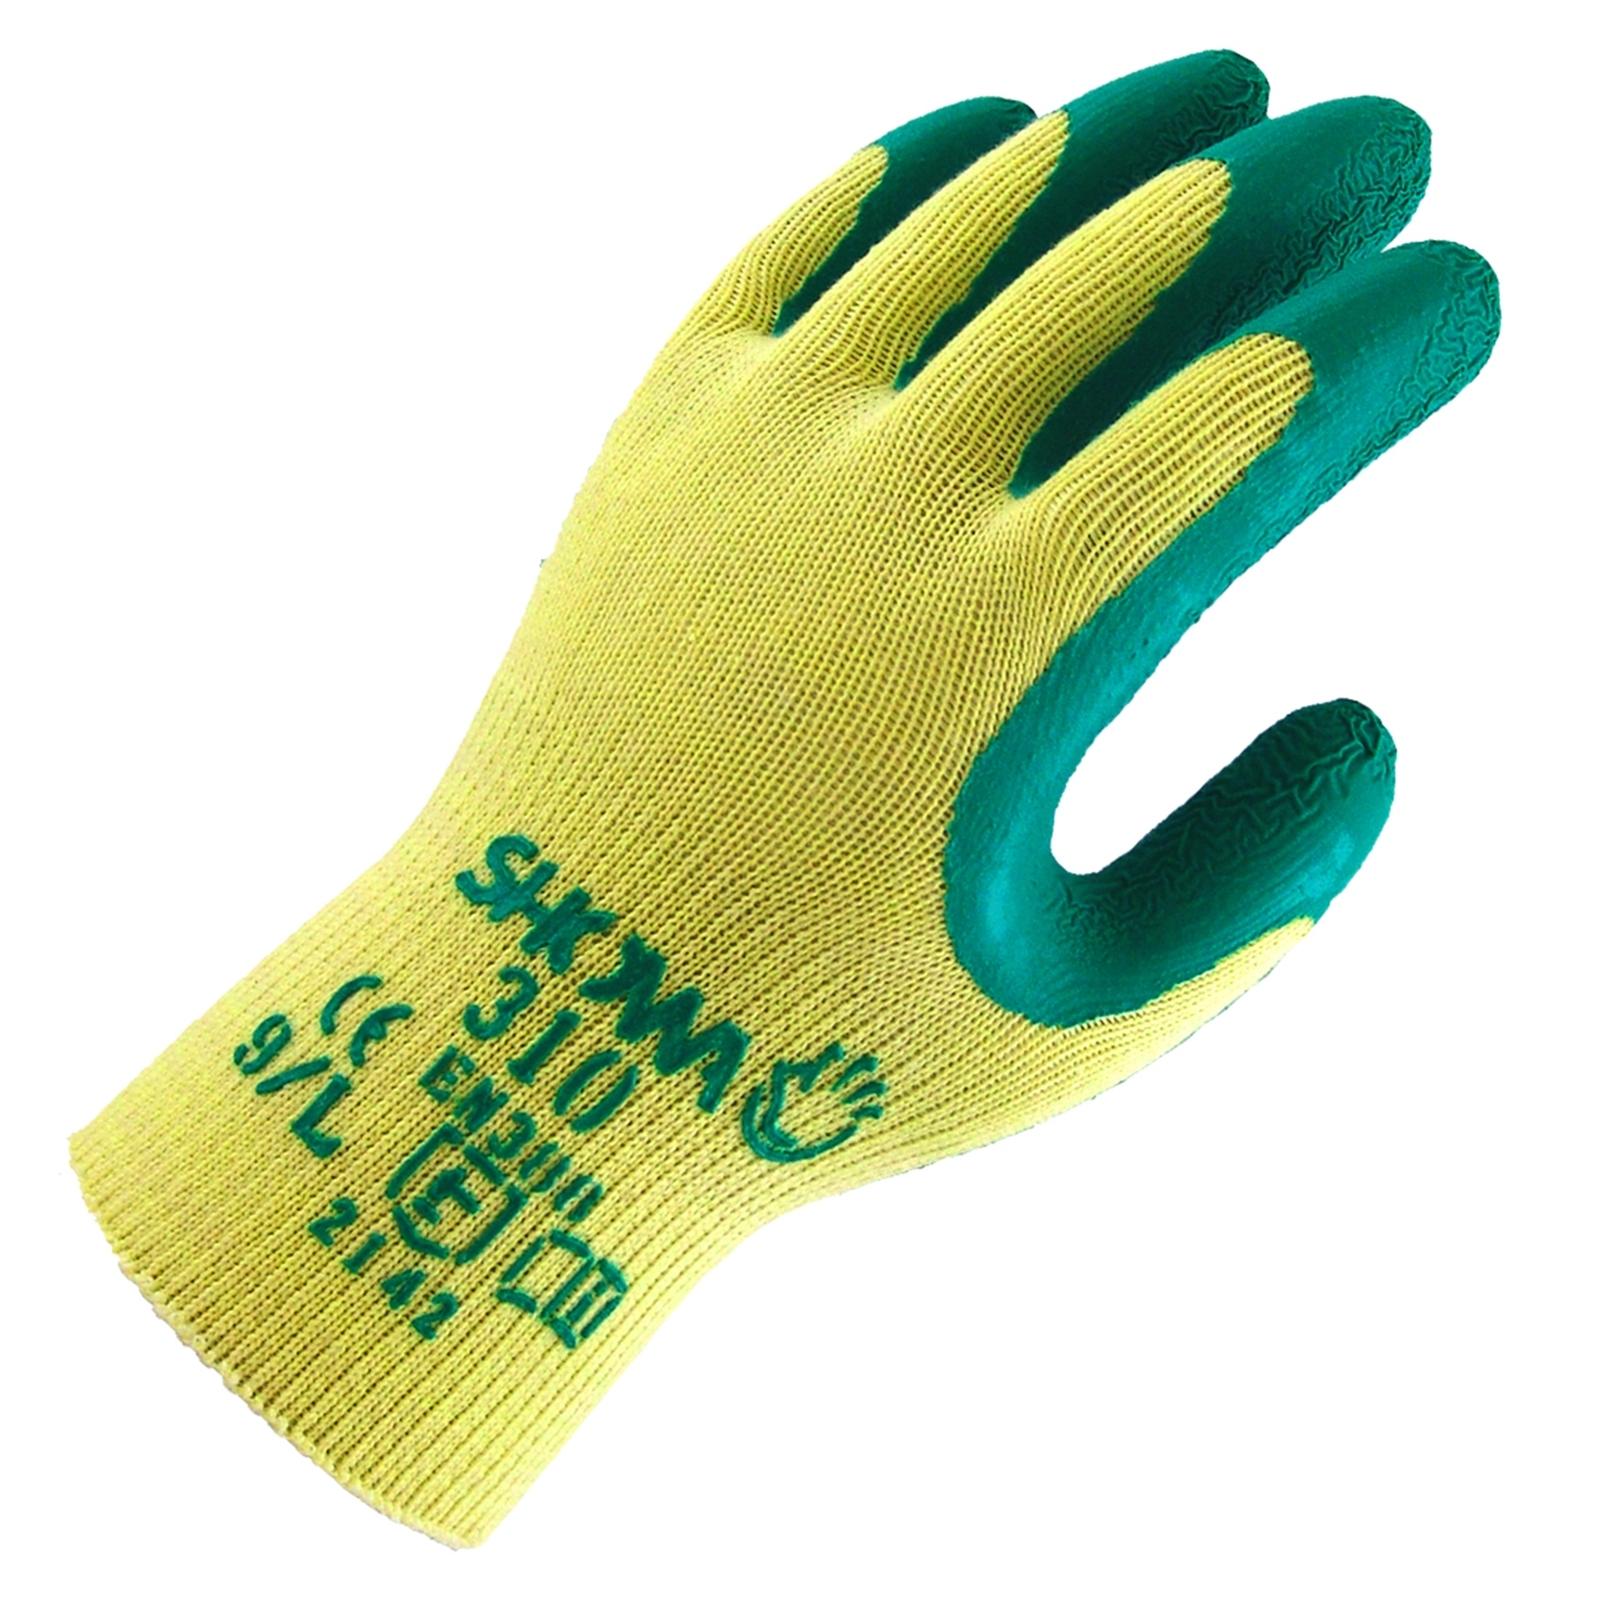 Lynn River Large Green and Yellow Showa 310 Latex Gardening Gloves